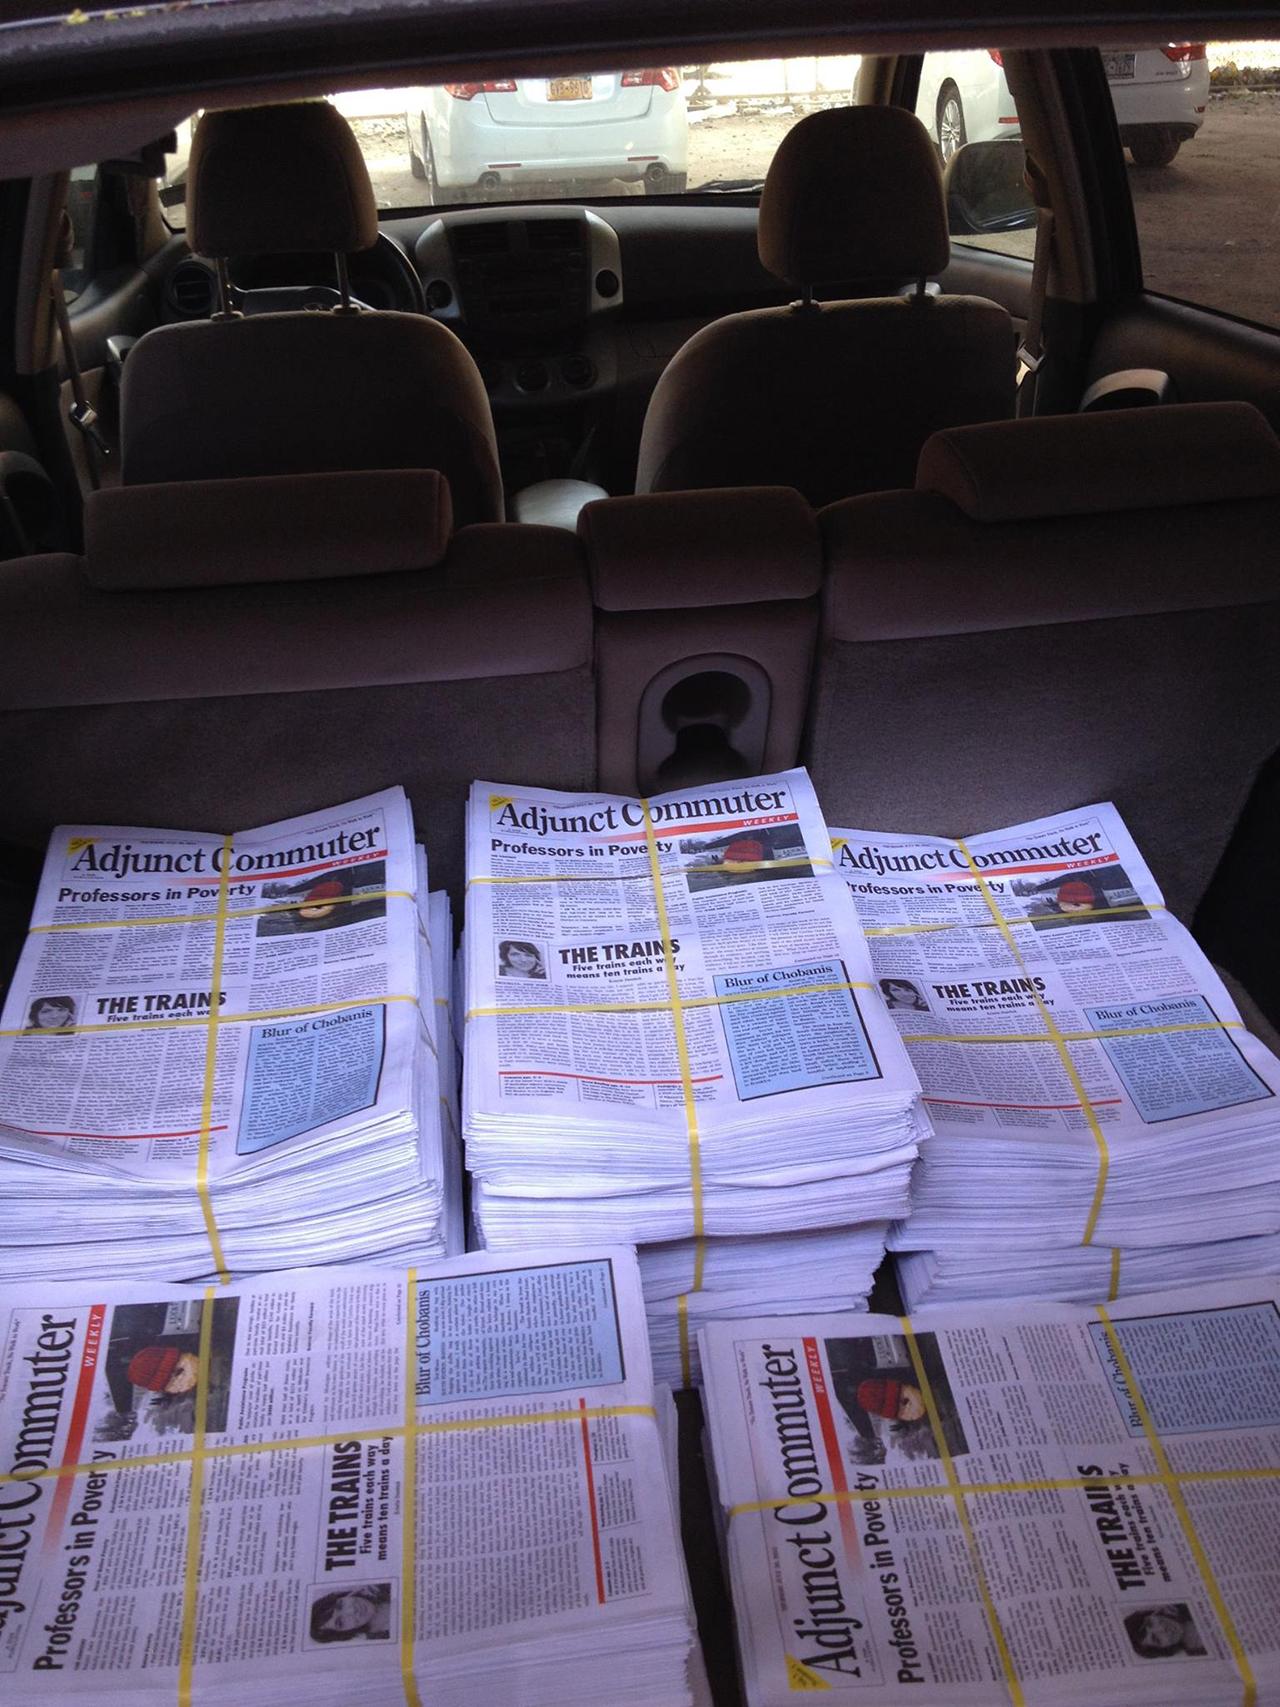 Copies of 'Adjunct Commuter Weekly' (image via Facebook) (click to enlarge)